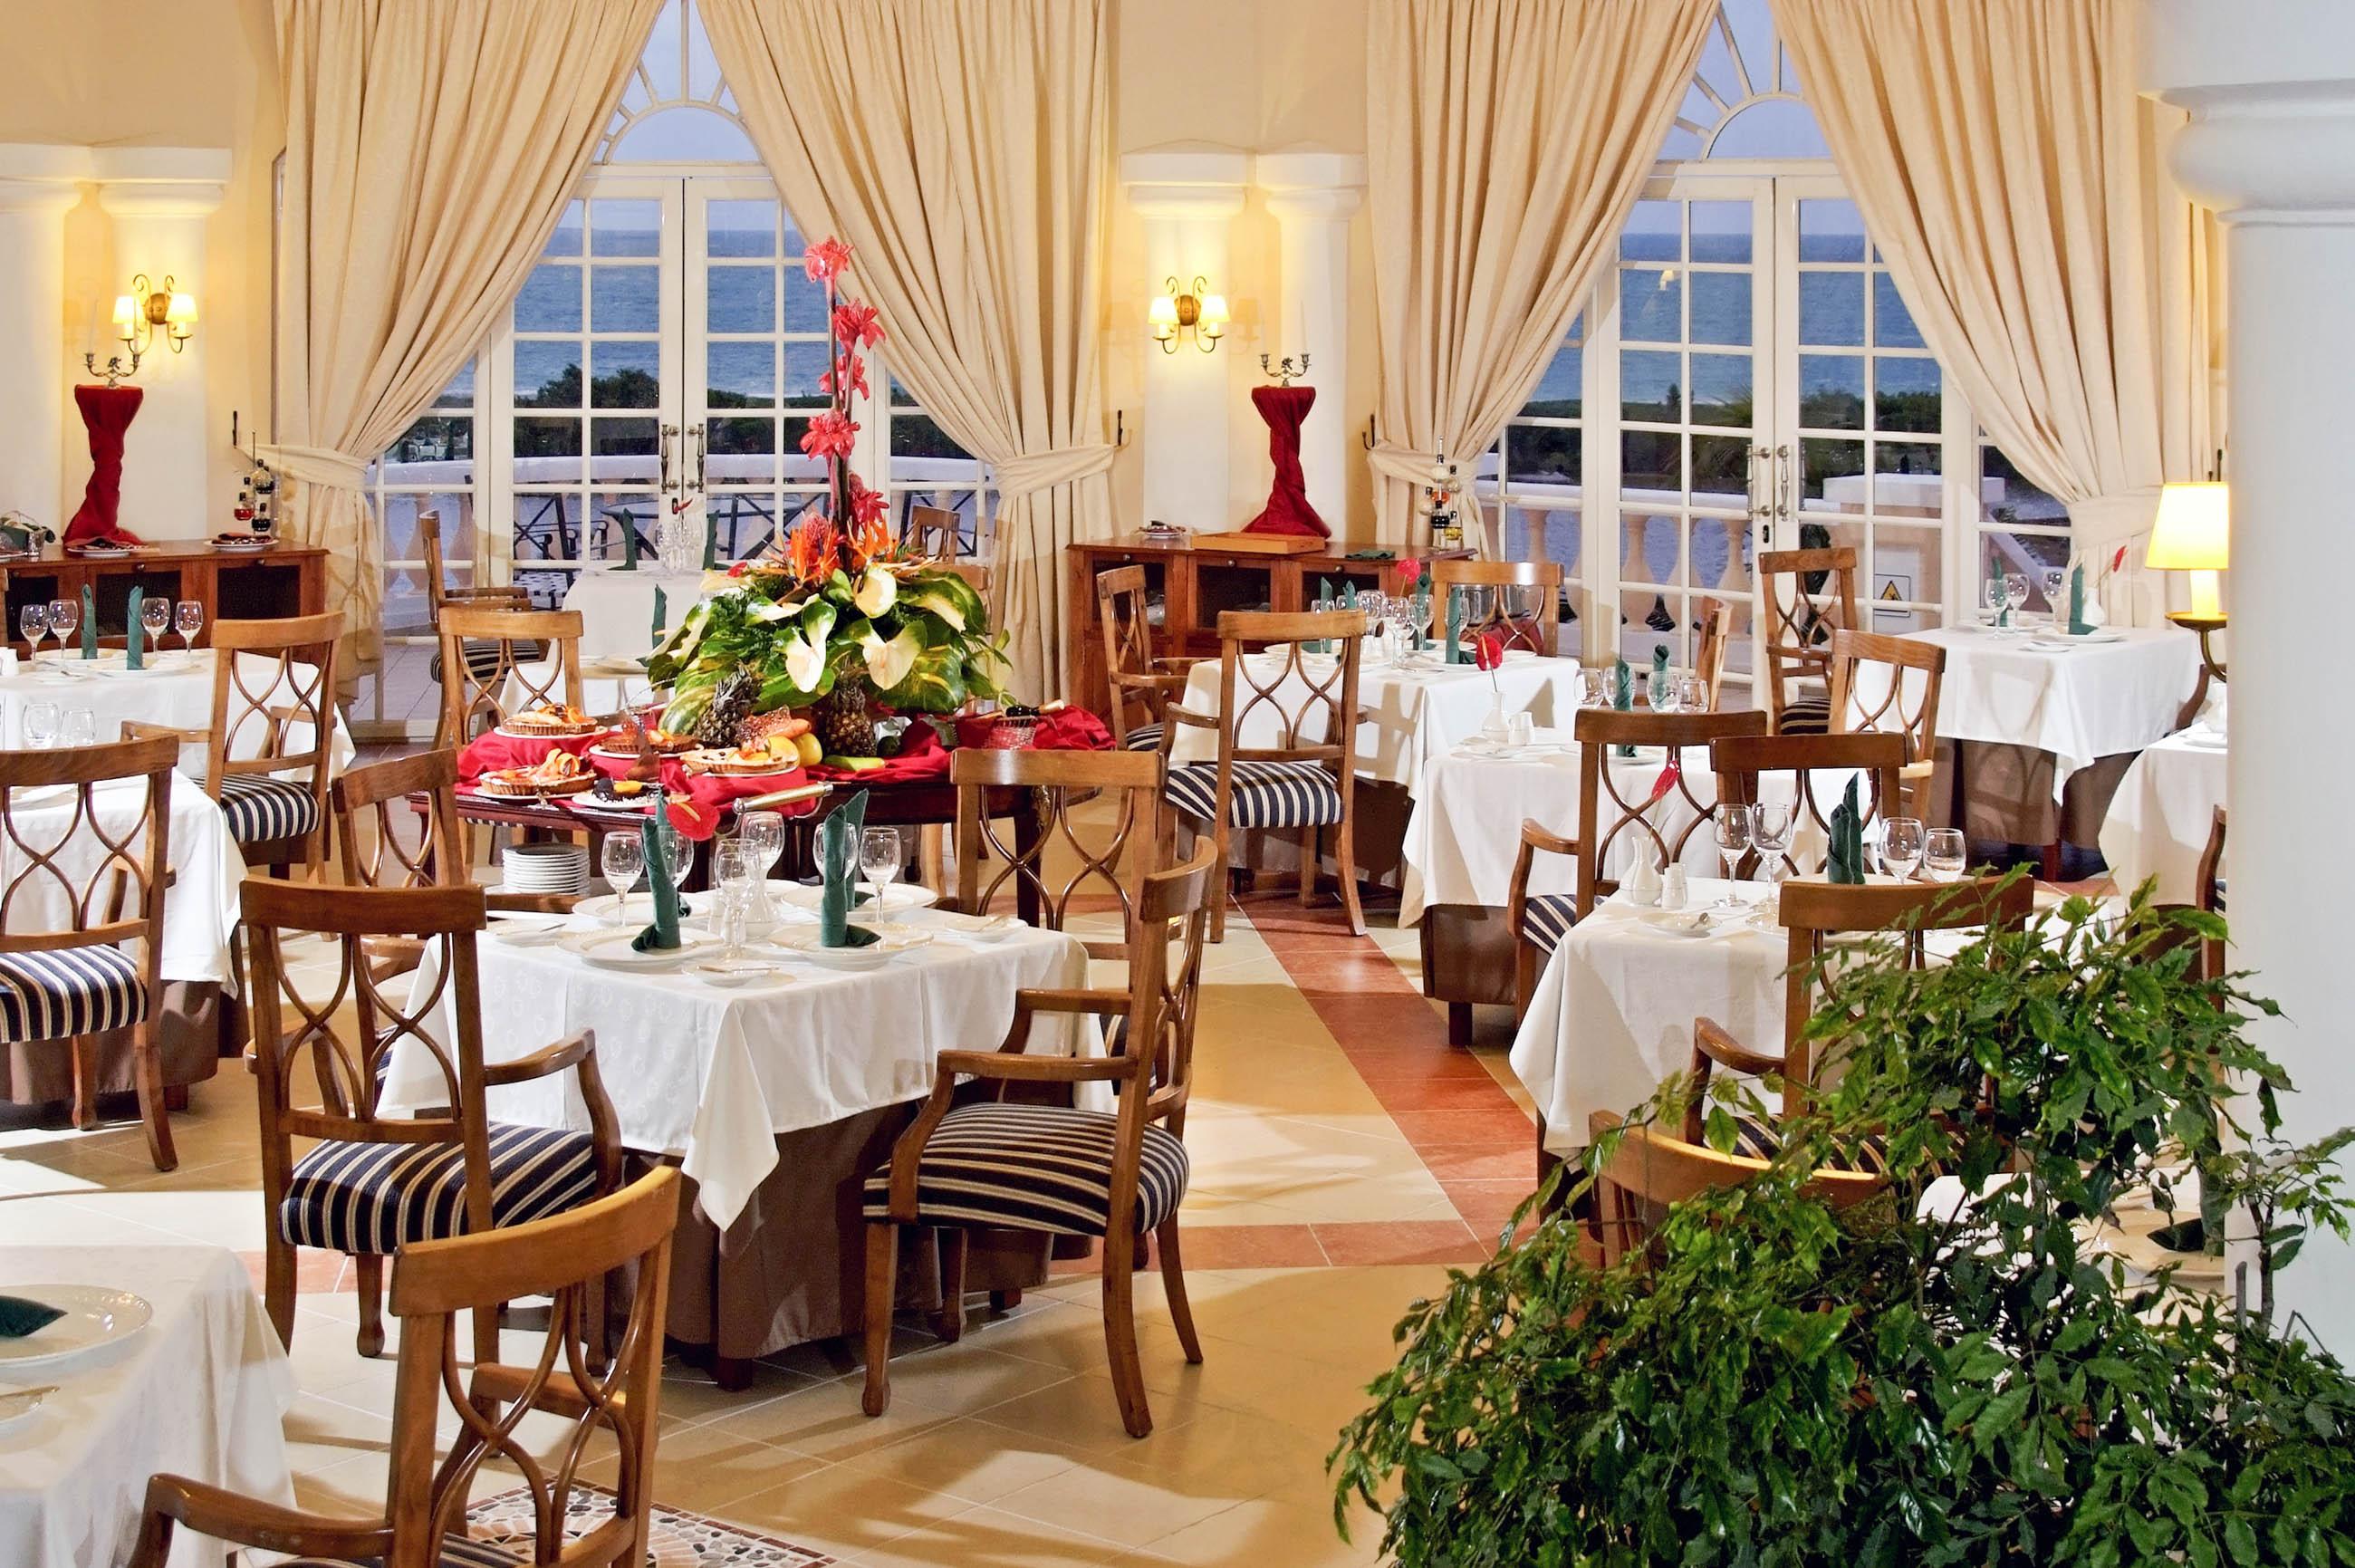 https://bubo.sk/uploads/galleries/7332/151paradisusprincesadelmar-hill_top_hideaway_restaurant_servicio_real_.jpg